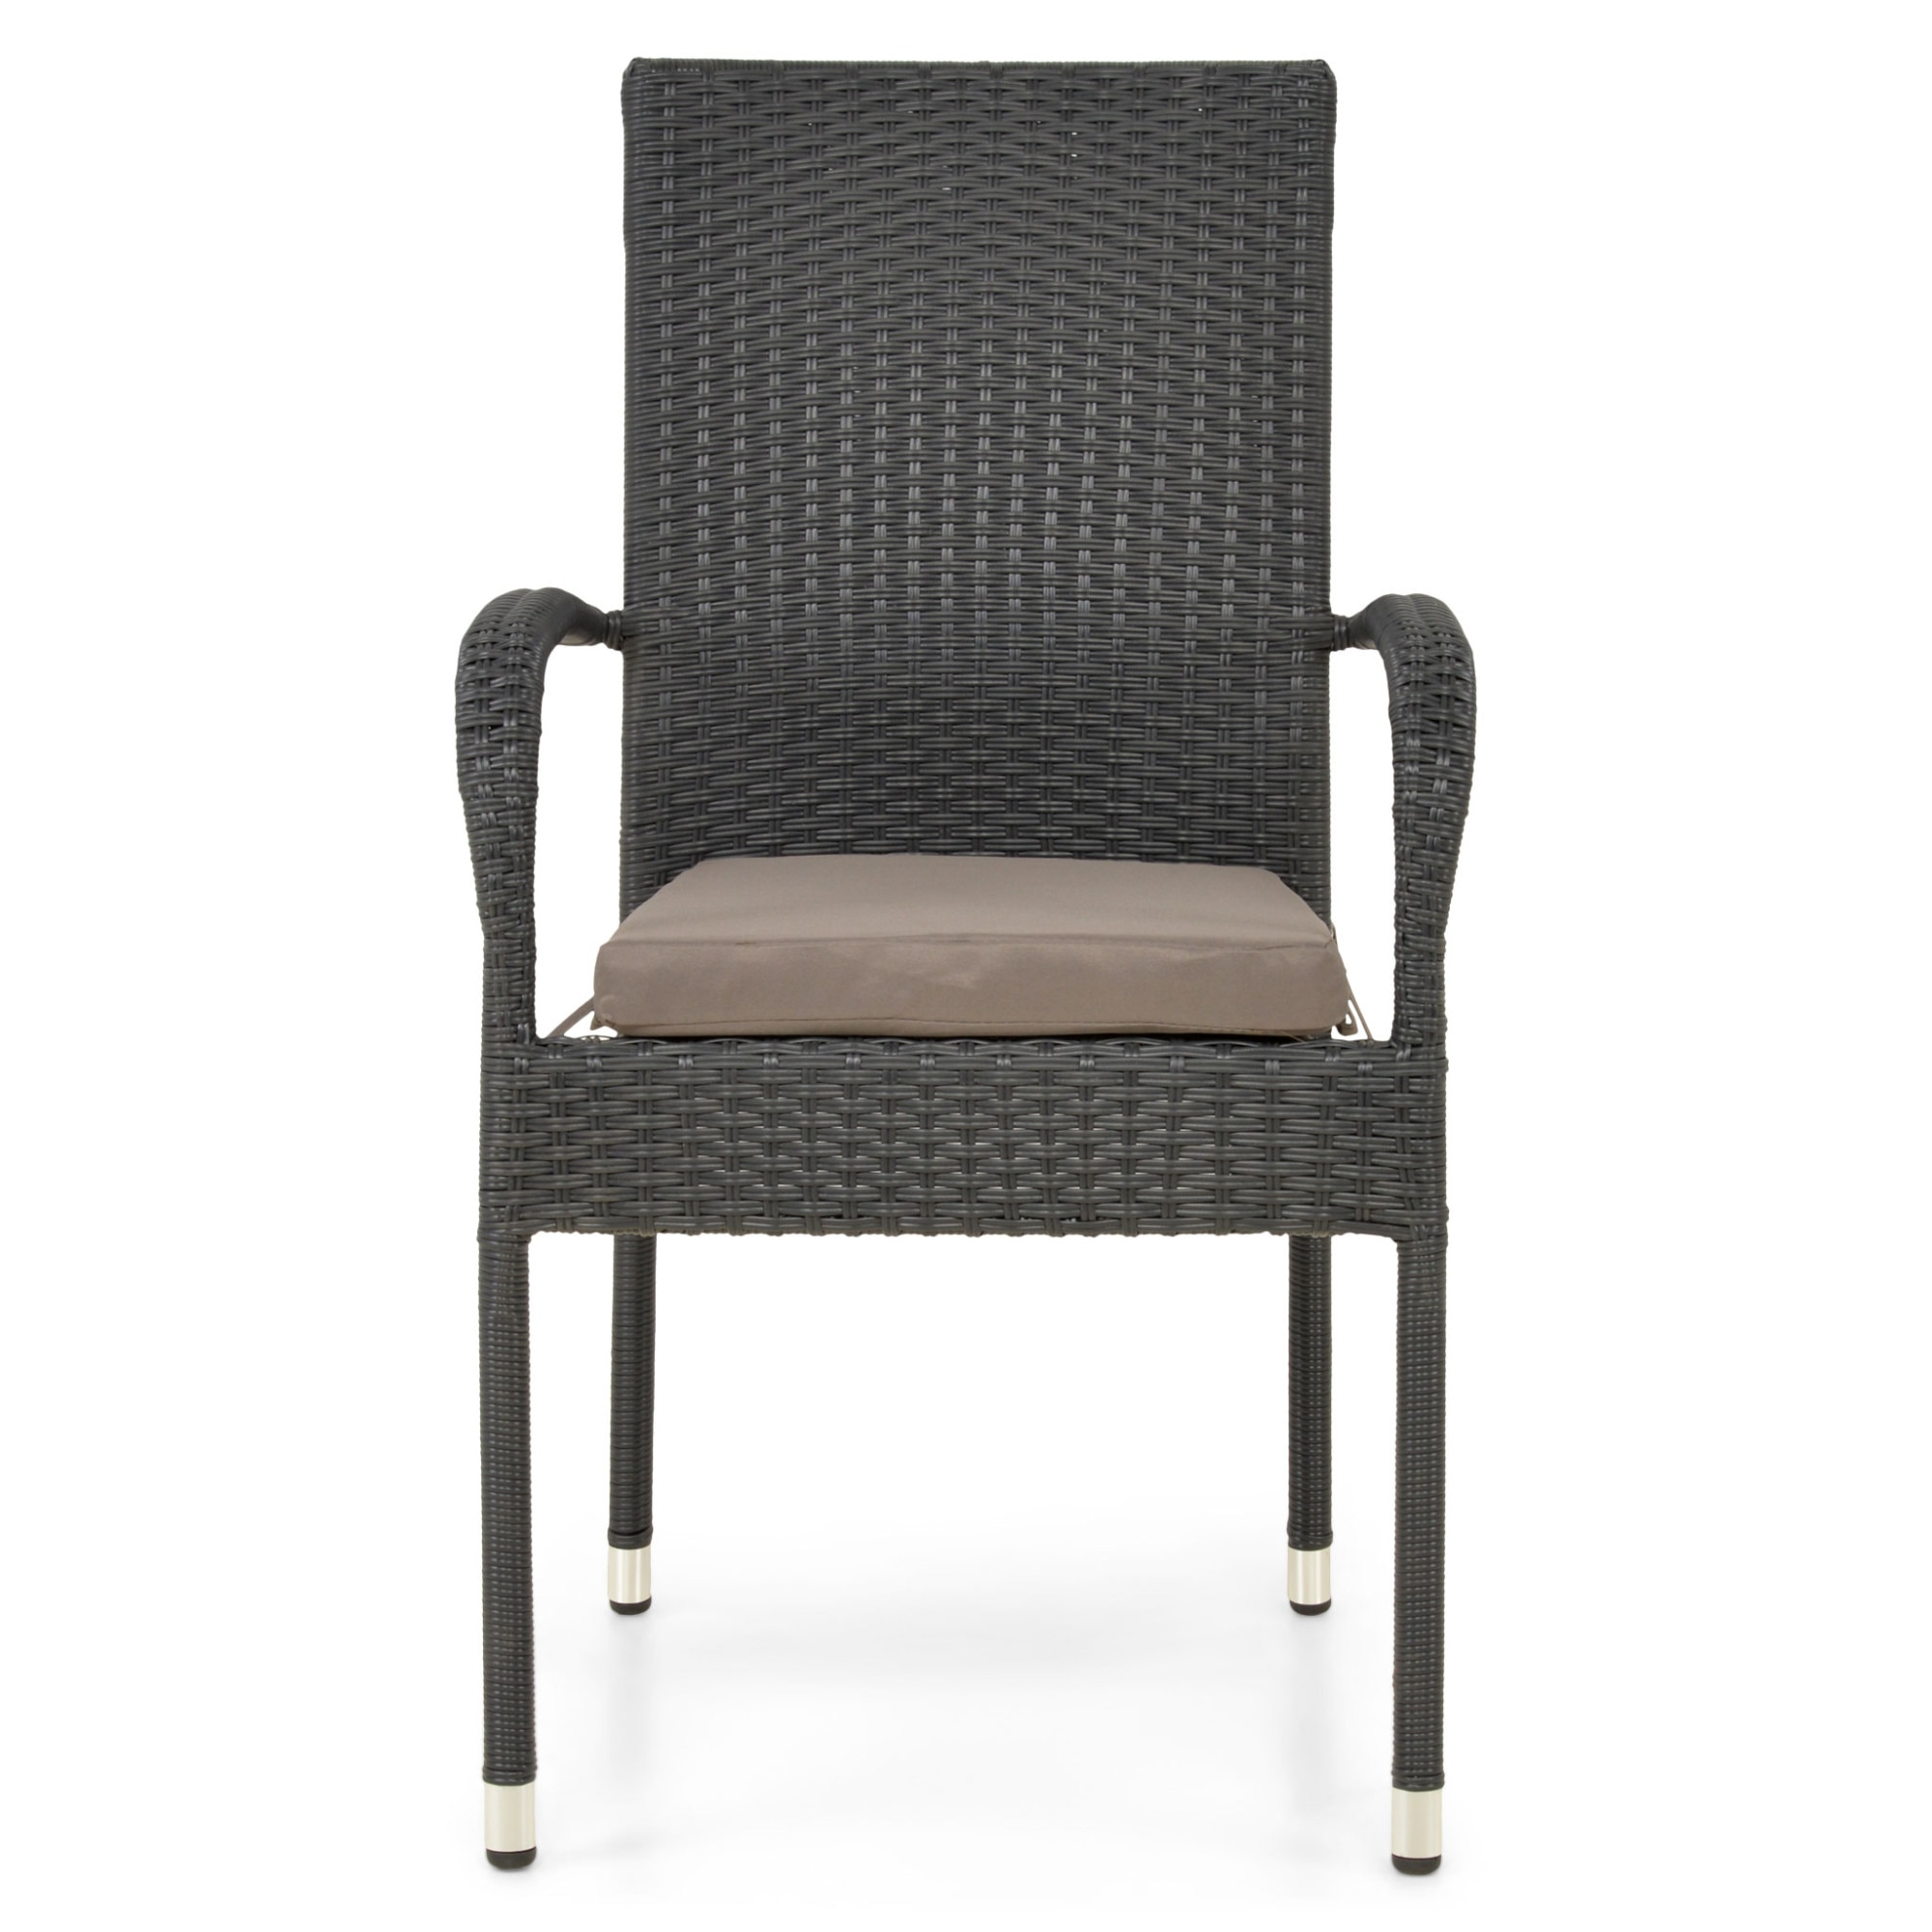 Scaun gradina/terasa PRESLEY 55.5x63x95 negru/gri